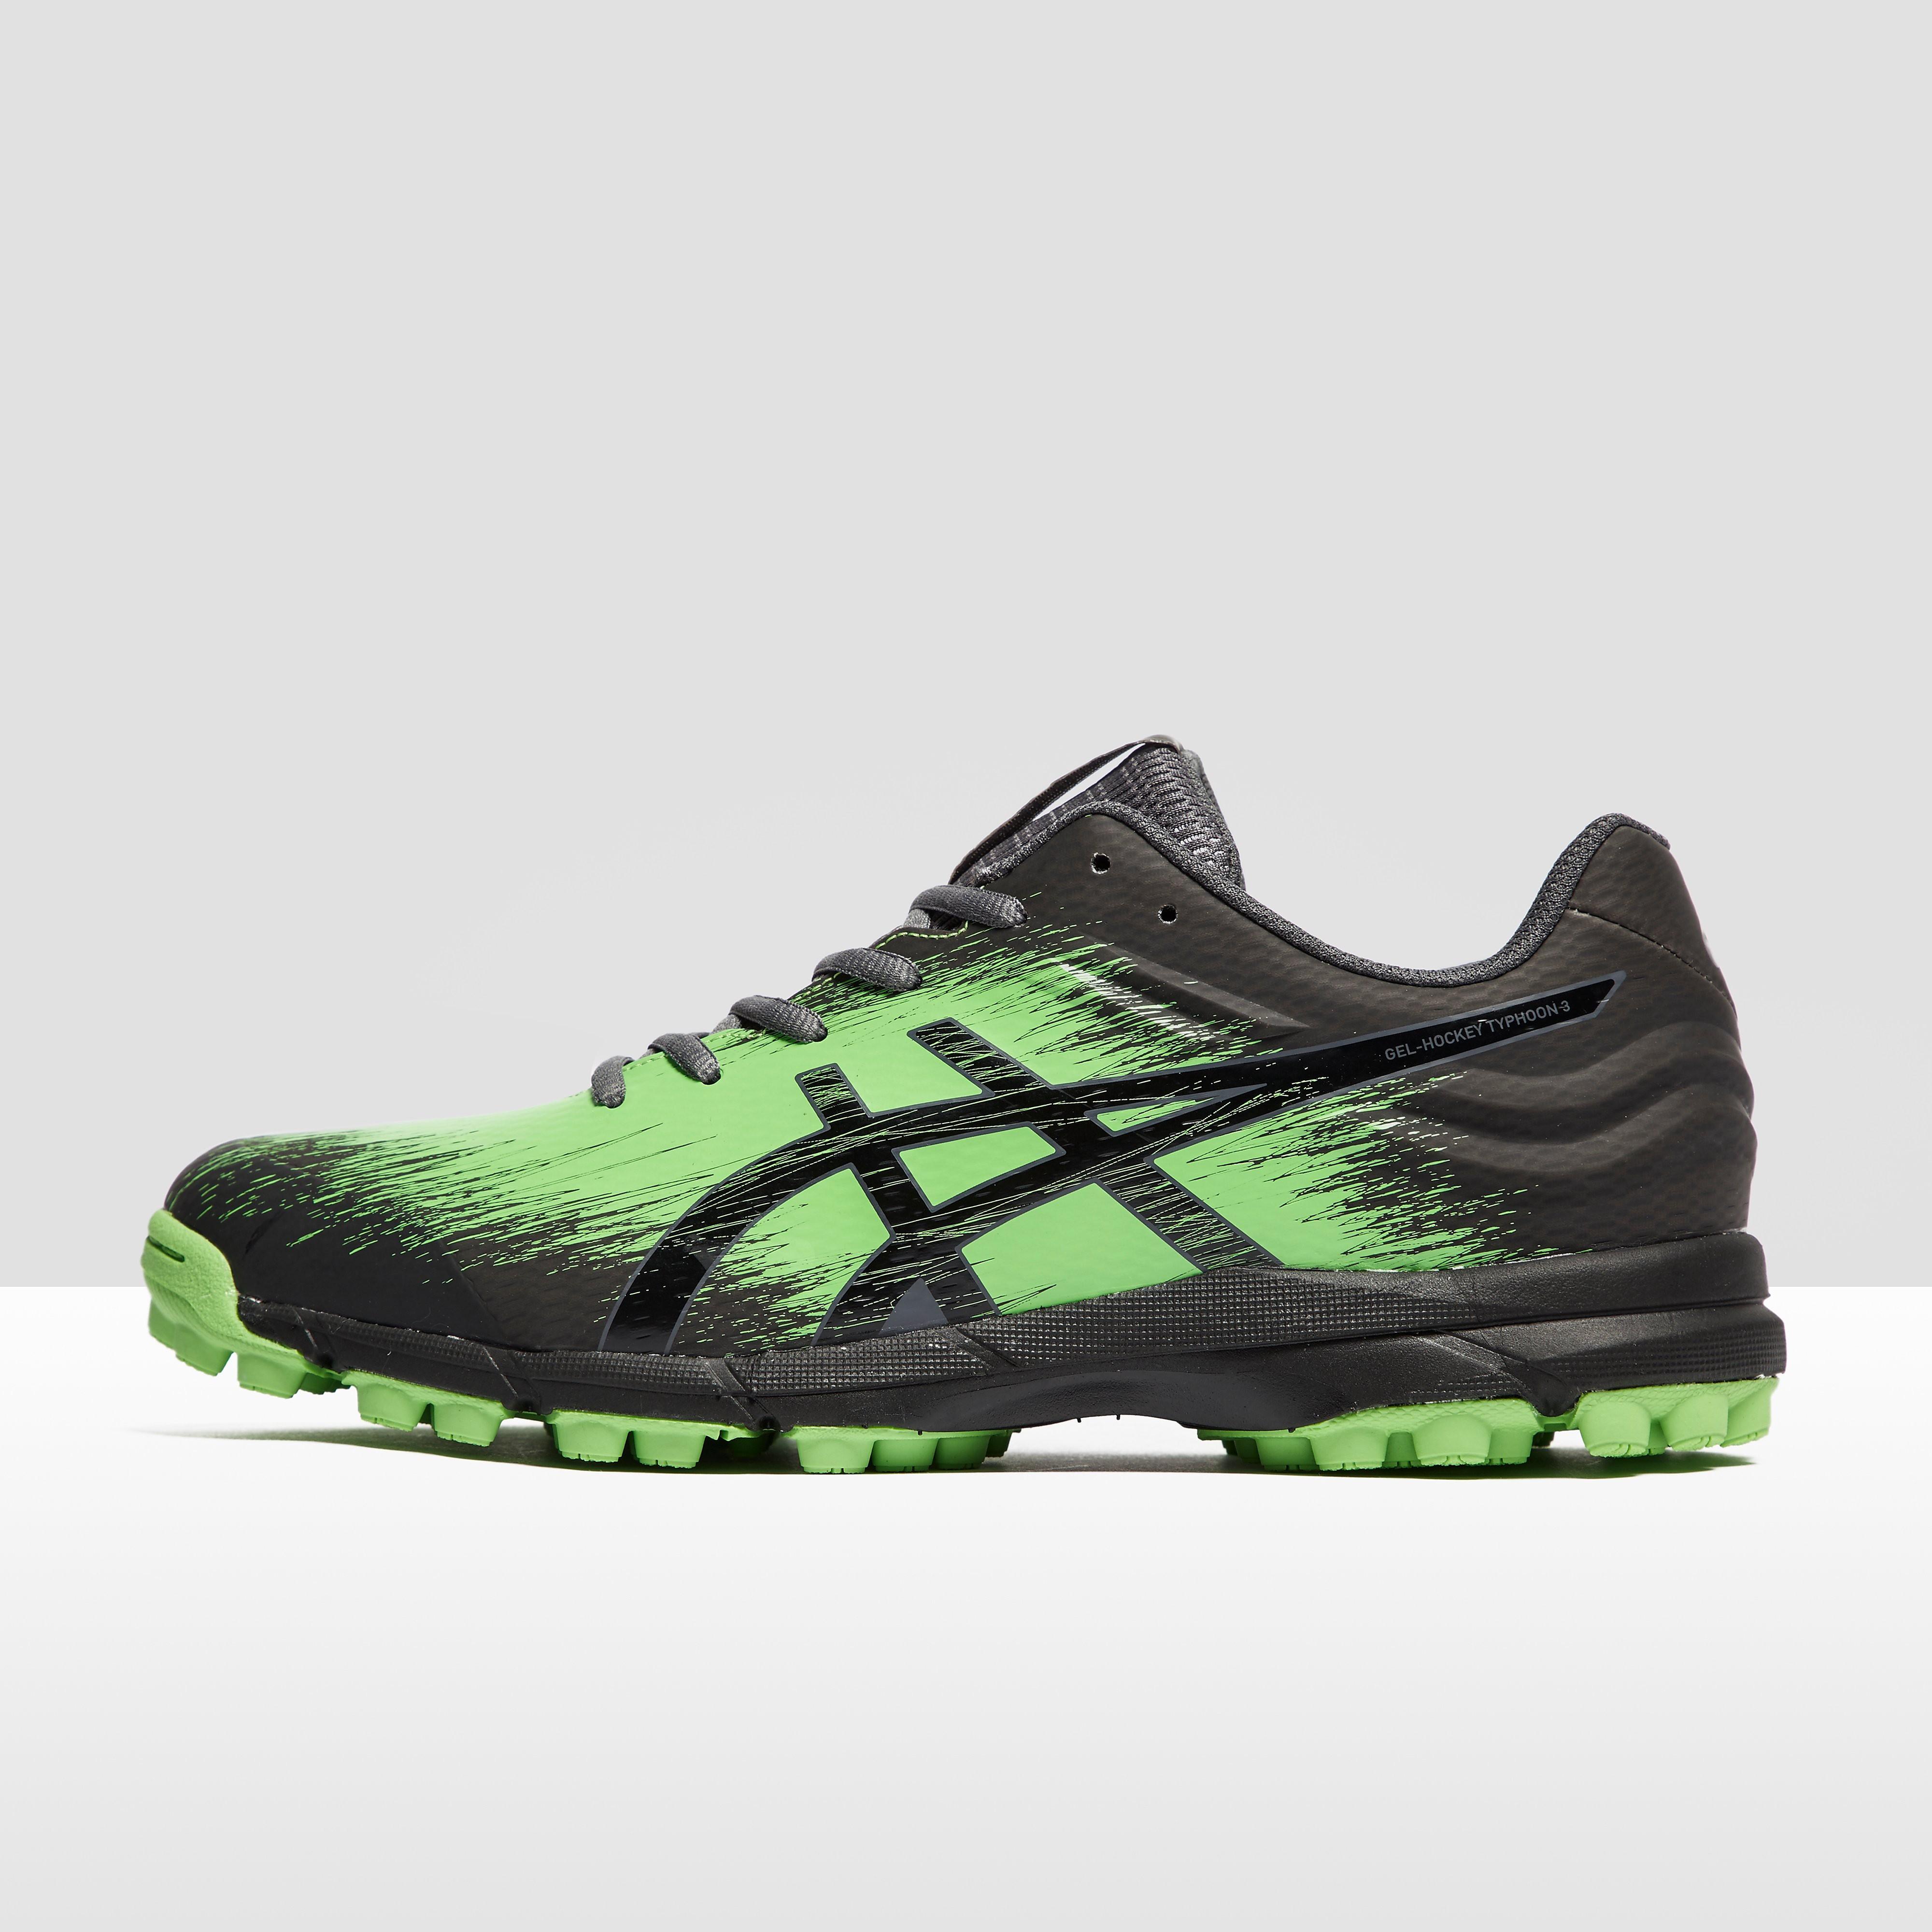 ASICS GEL-Hockey Typhoon 3 Men's Shoes